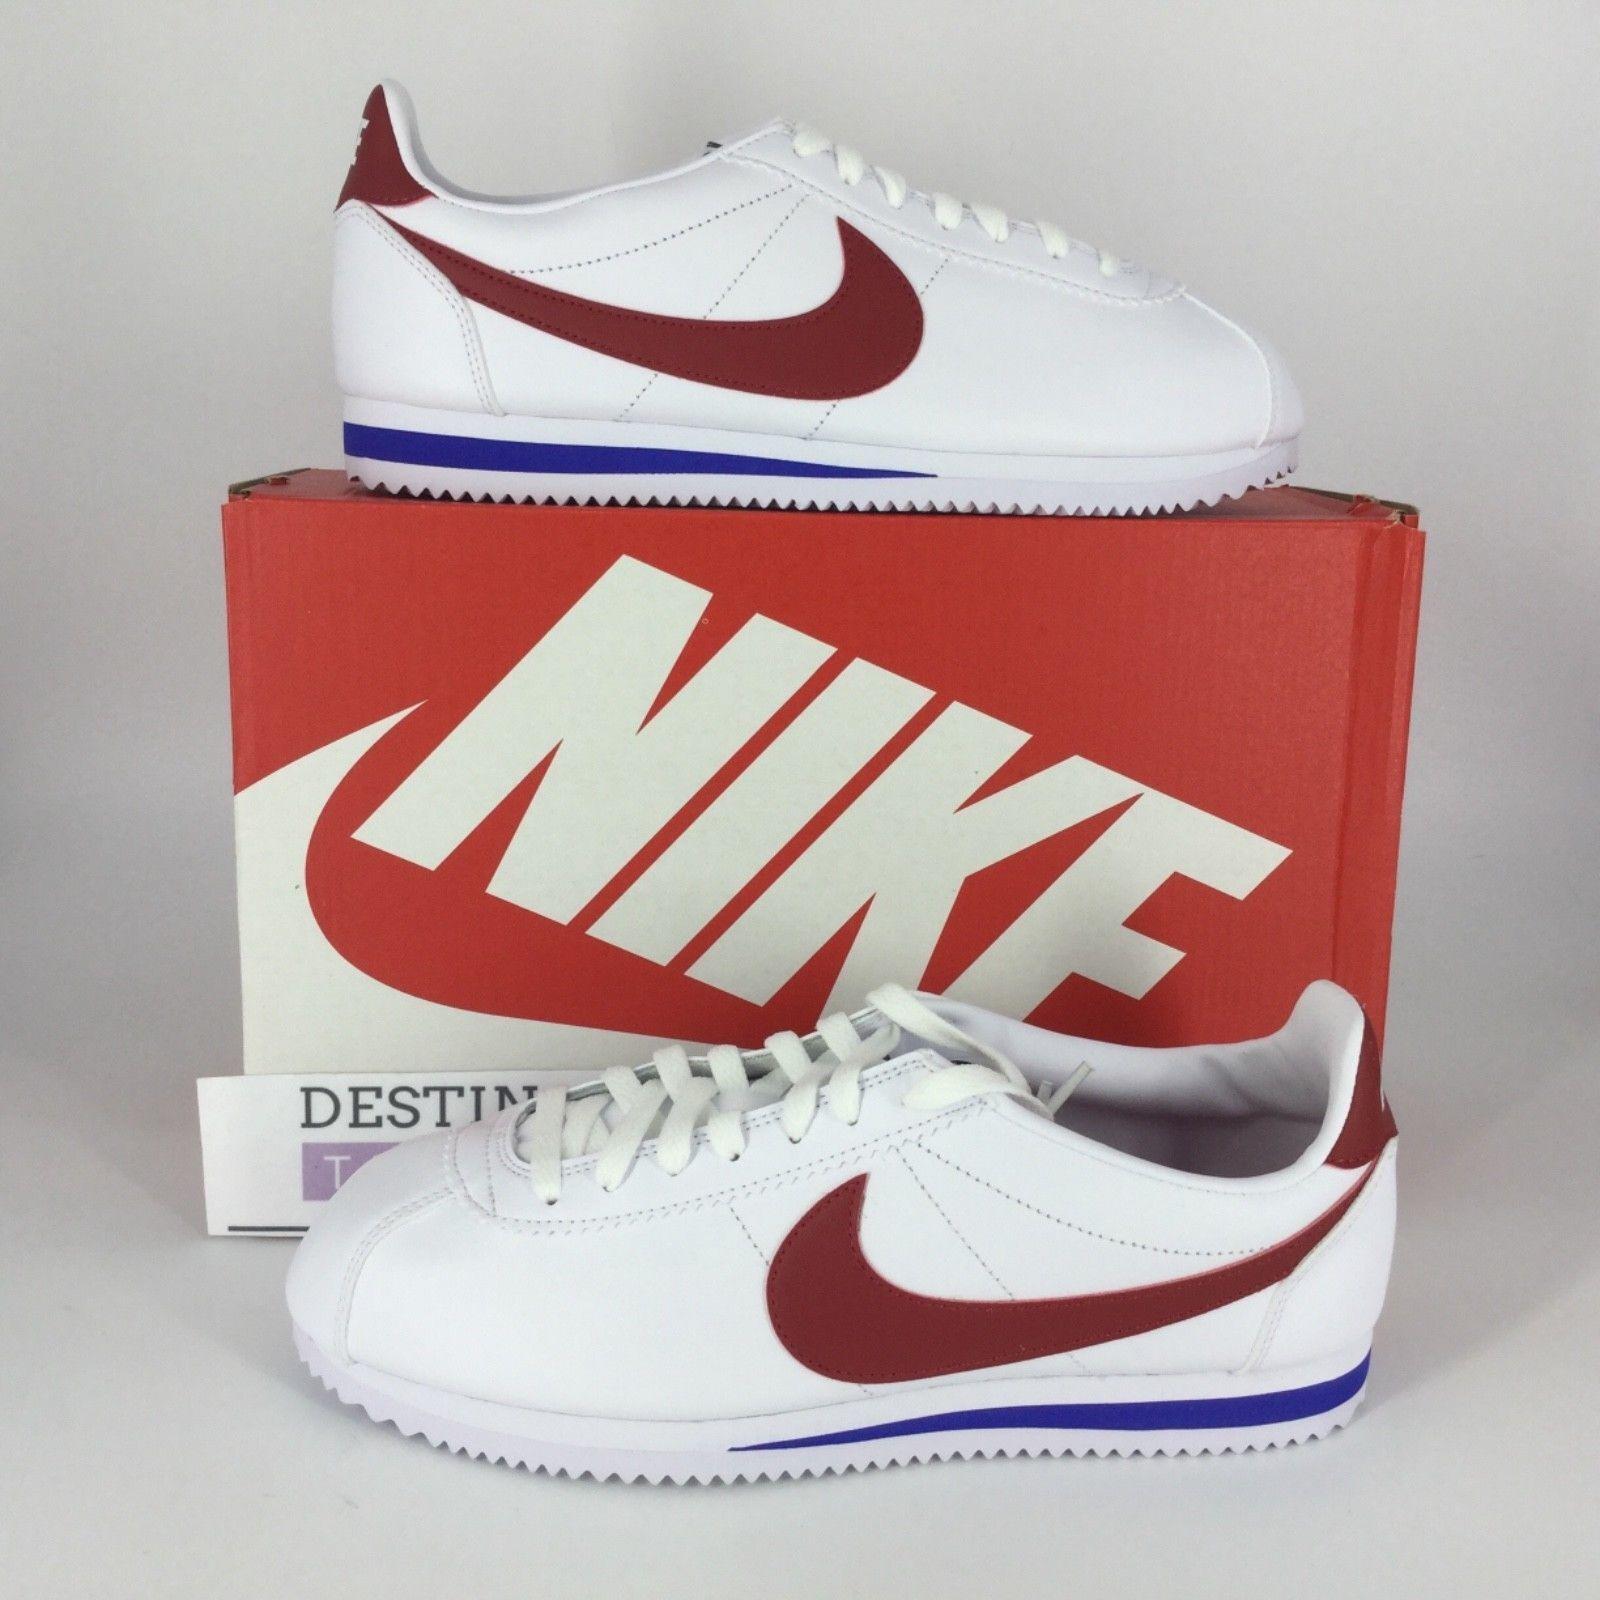 Nike Cortez  Red White Blue DUCHESS MEGHAN MARKLE Seen 9.5 10 10.5 11